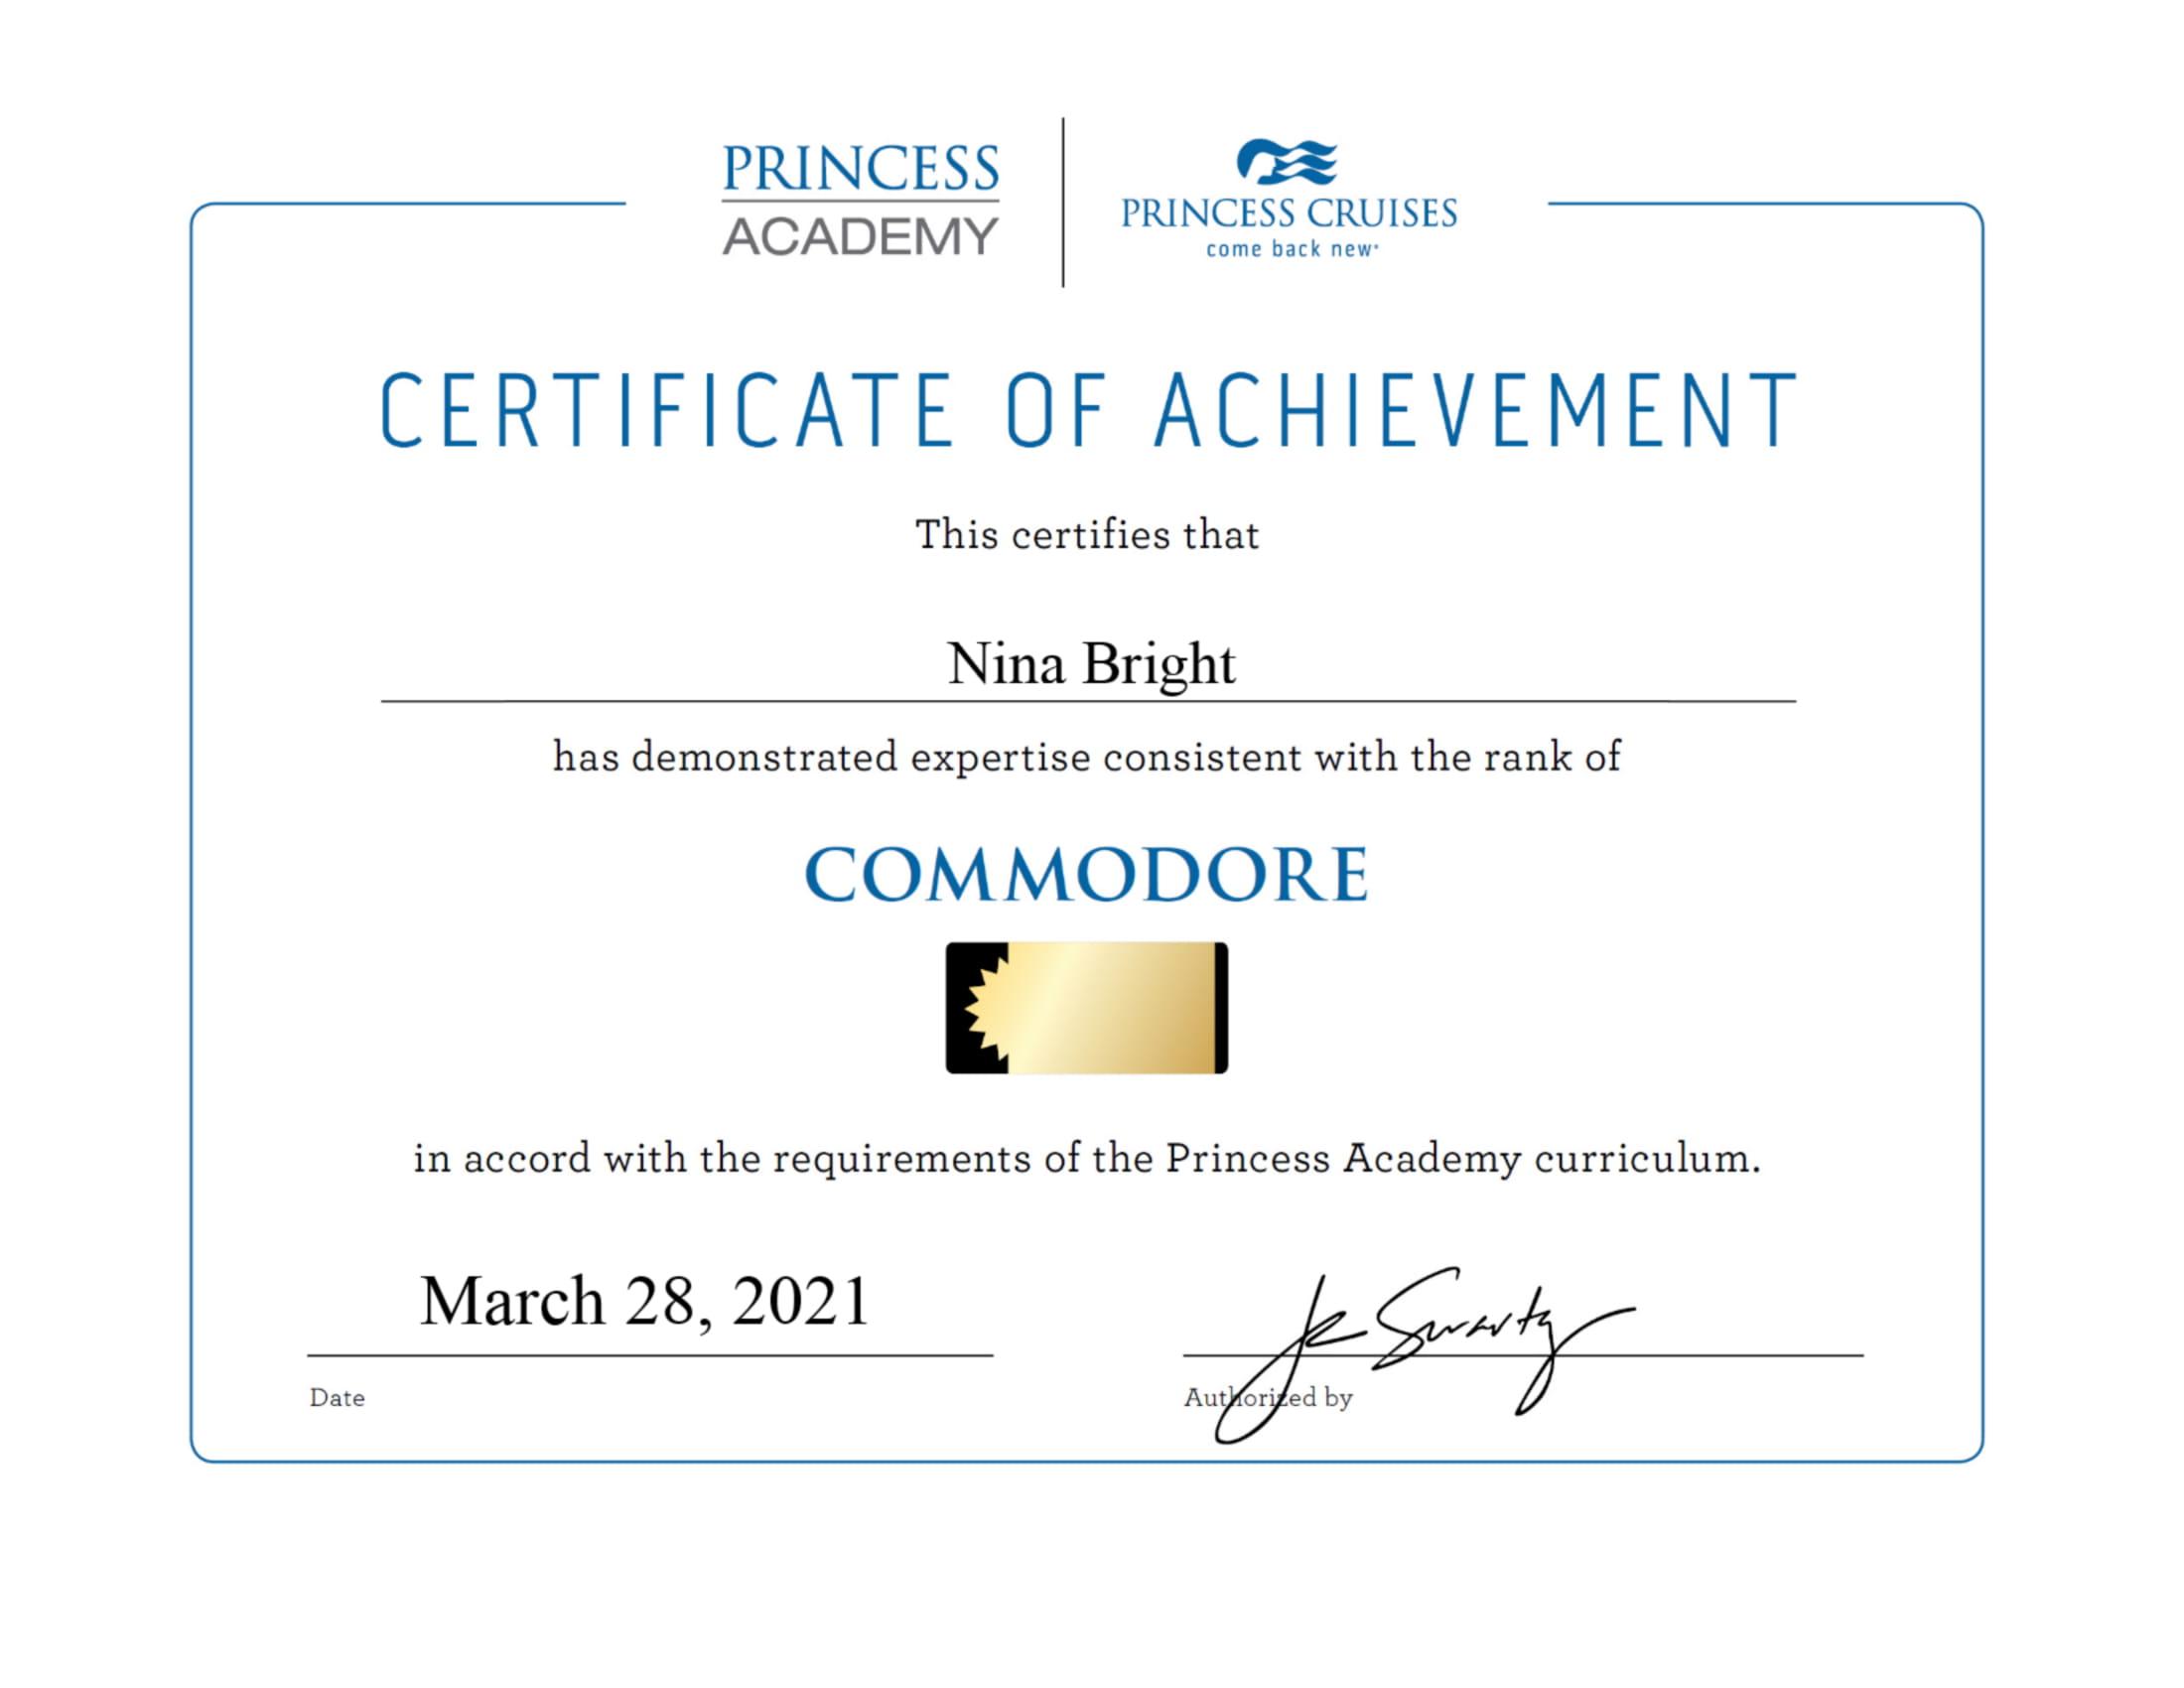 Princess Cruises Commodore Certificate-1